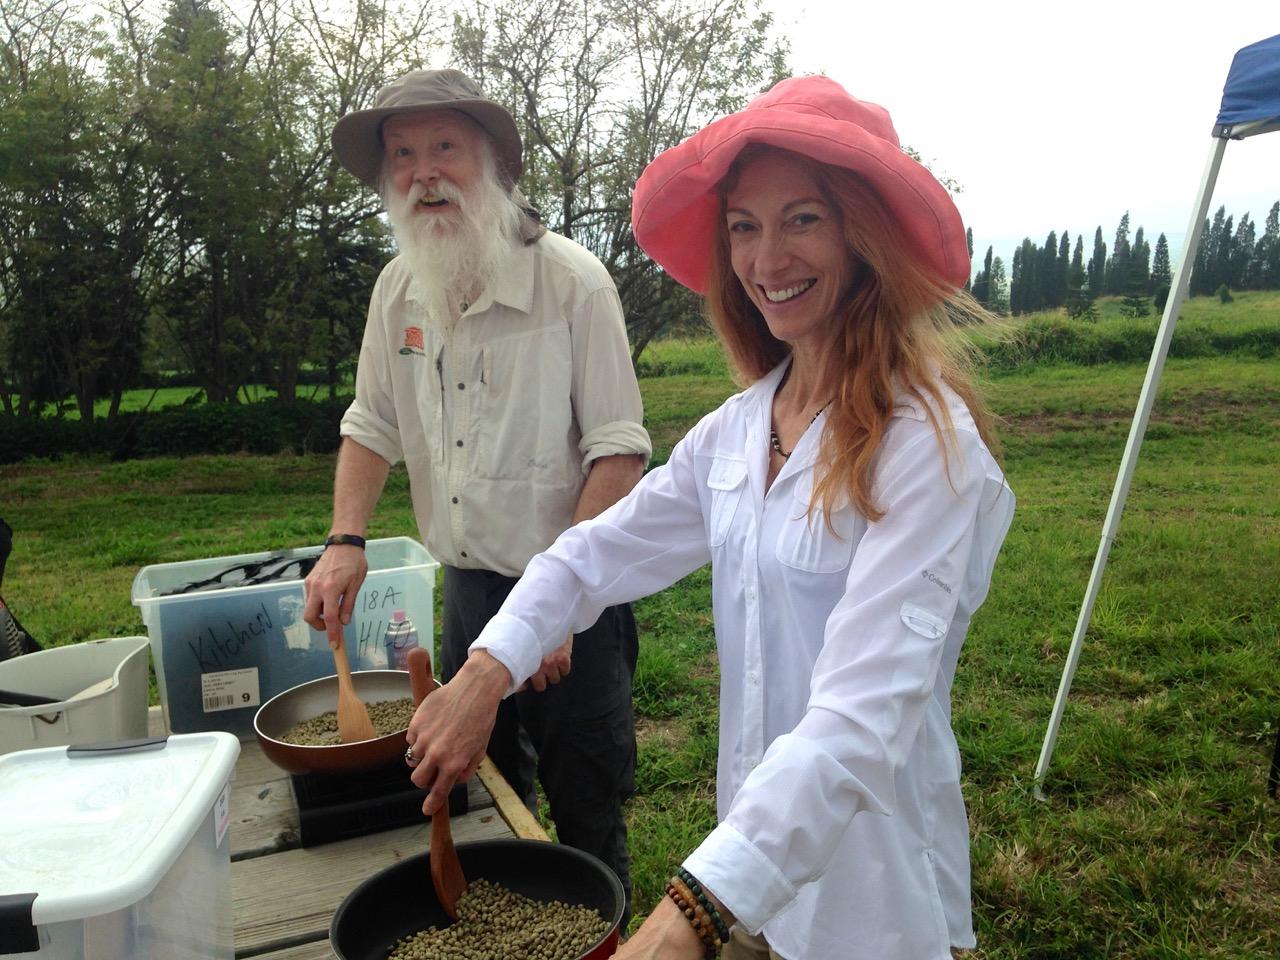 Lisa-and-Taylor-cooking-coffee-FABULOUS.jpg